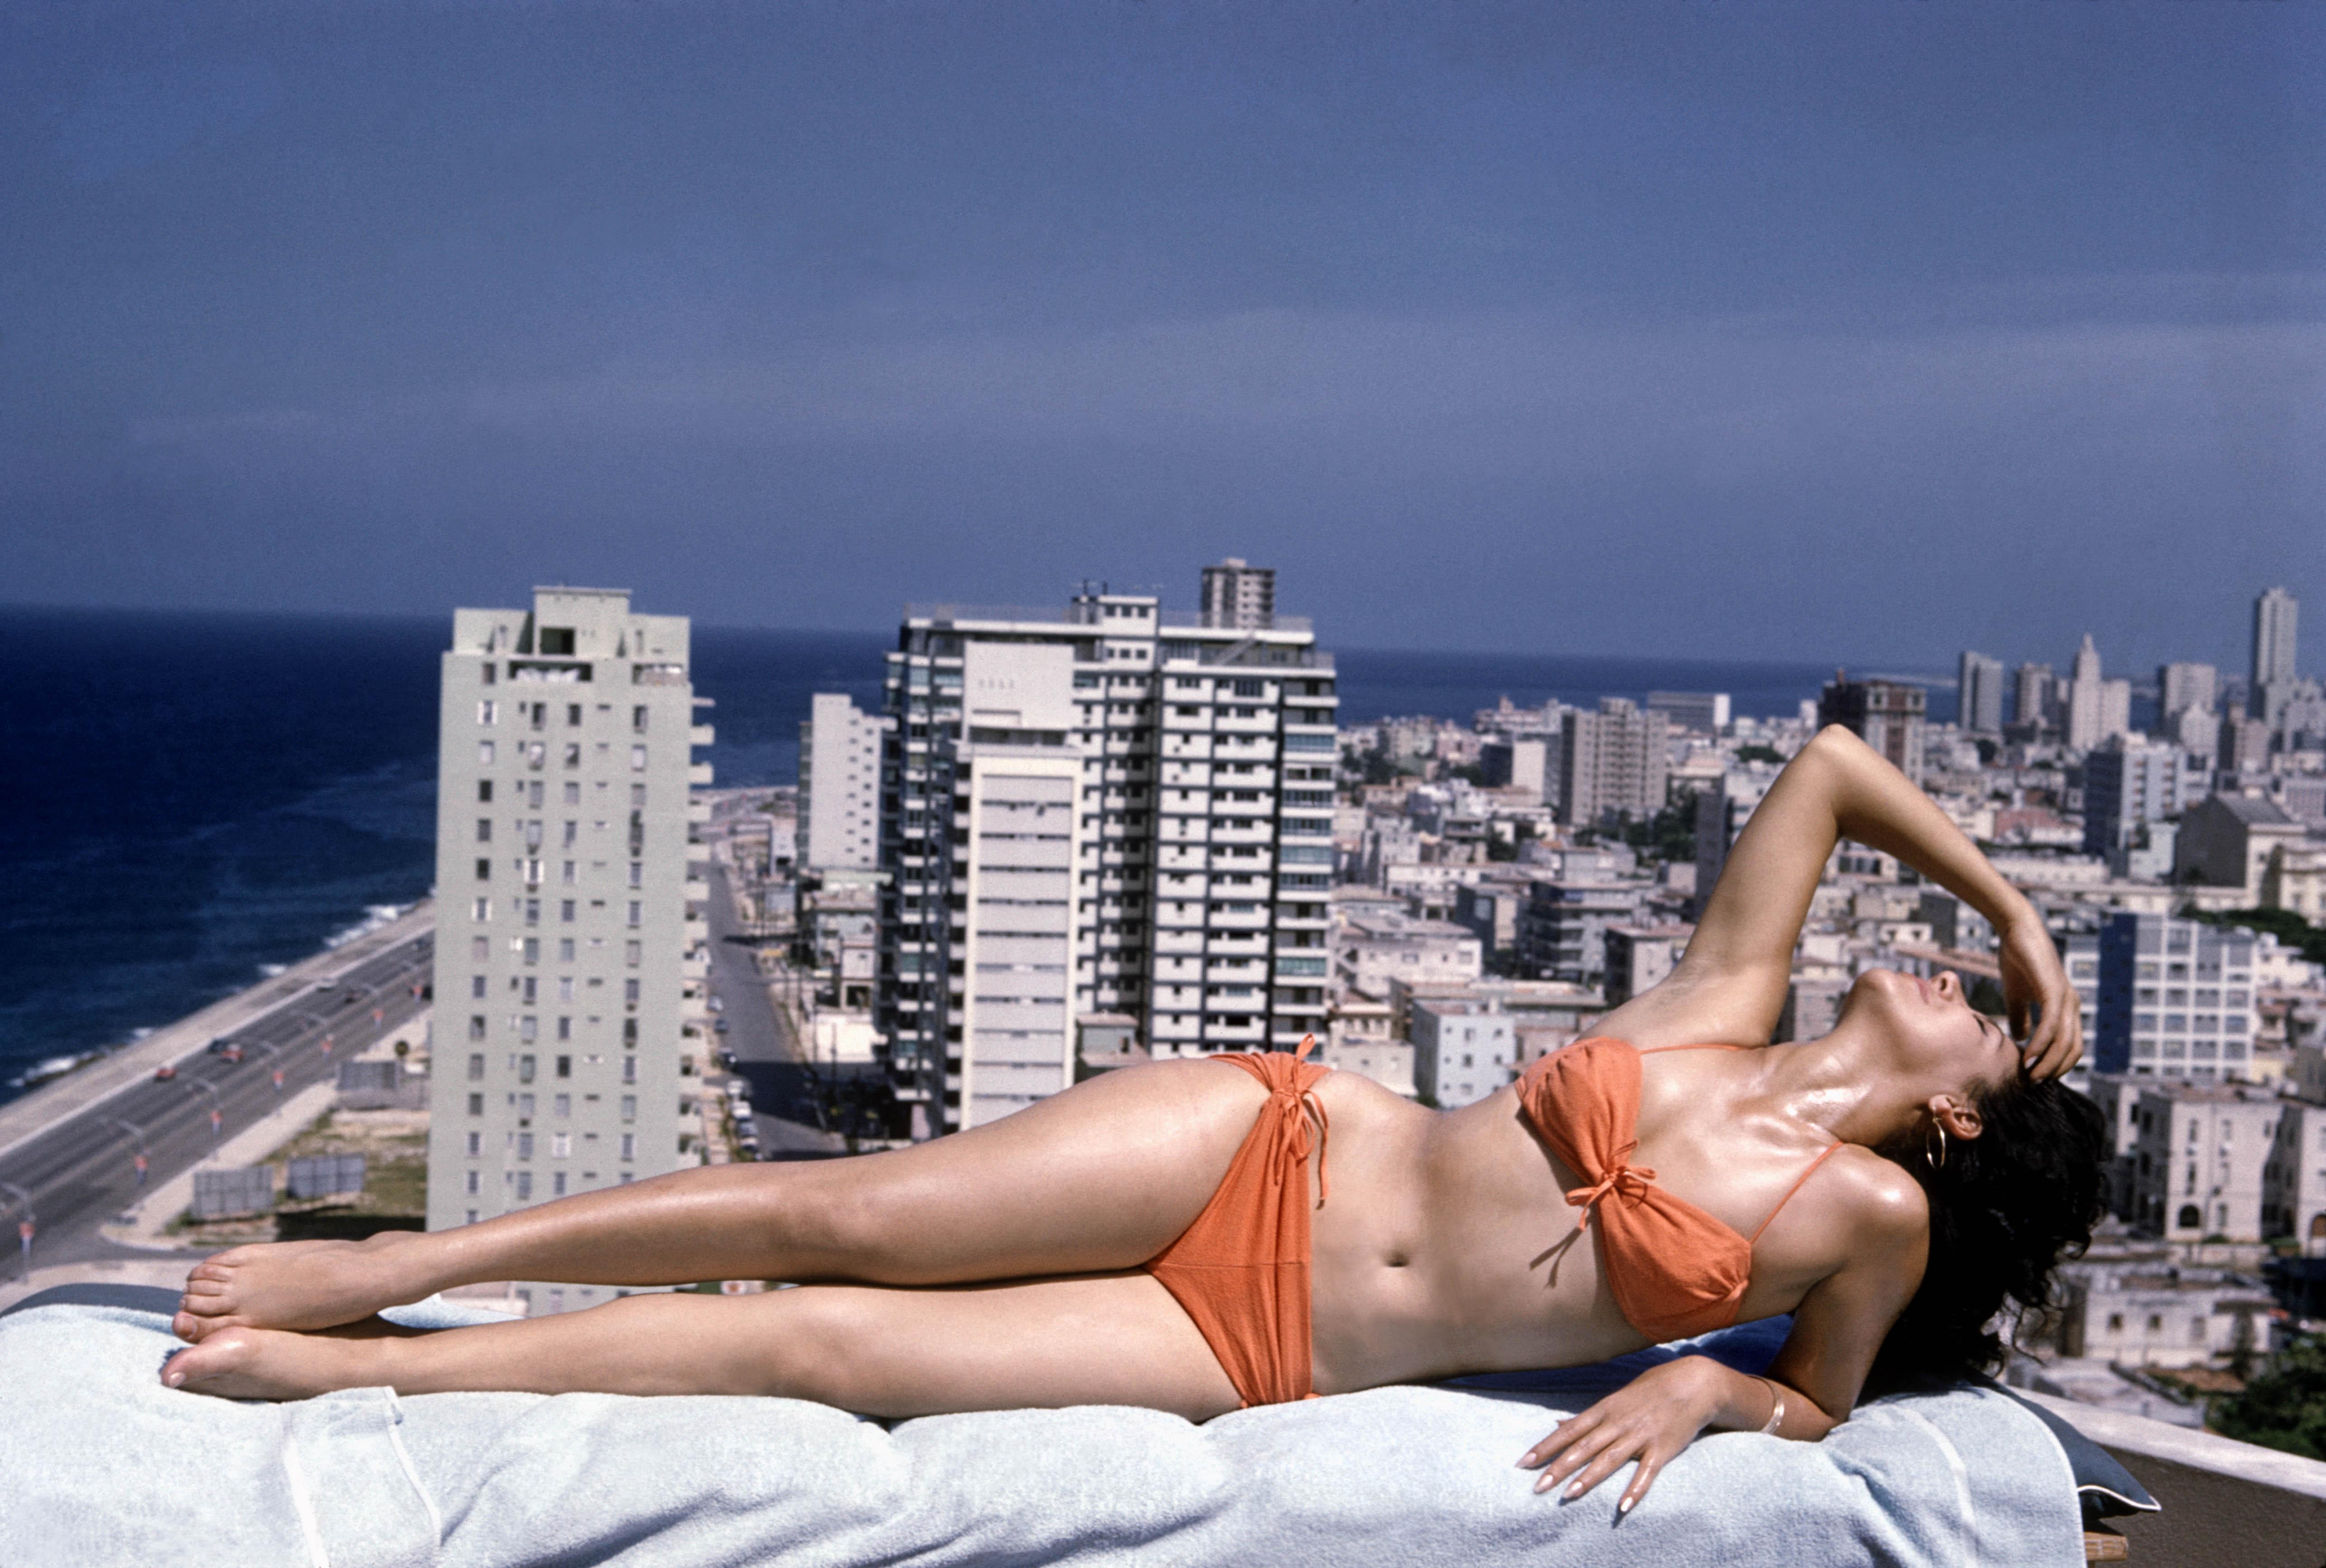 70 Magnum Photographed By Bikini At The Photographers KJc13FuTl